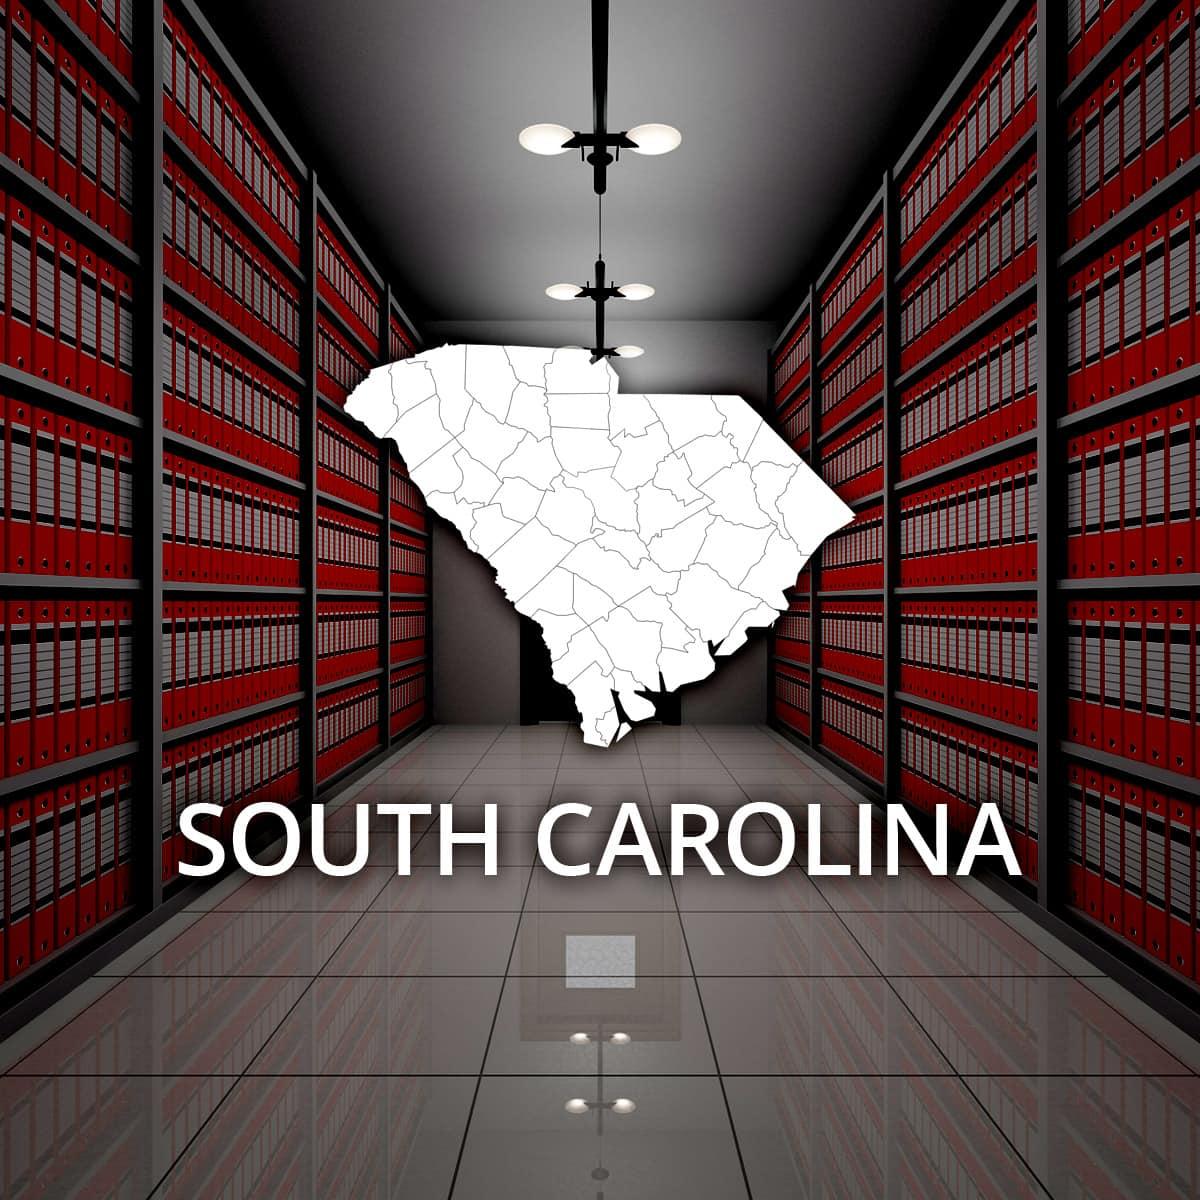 South Carolina Public Records